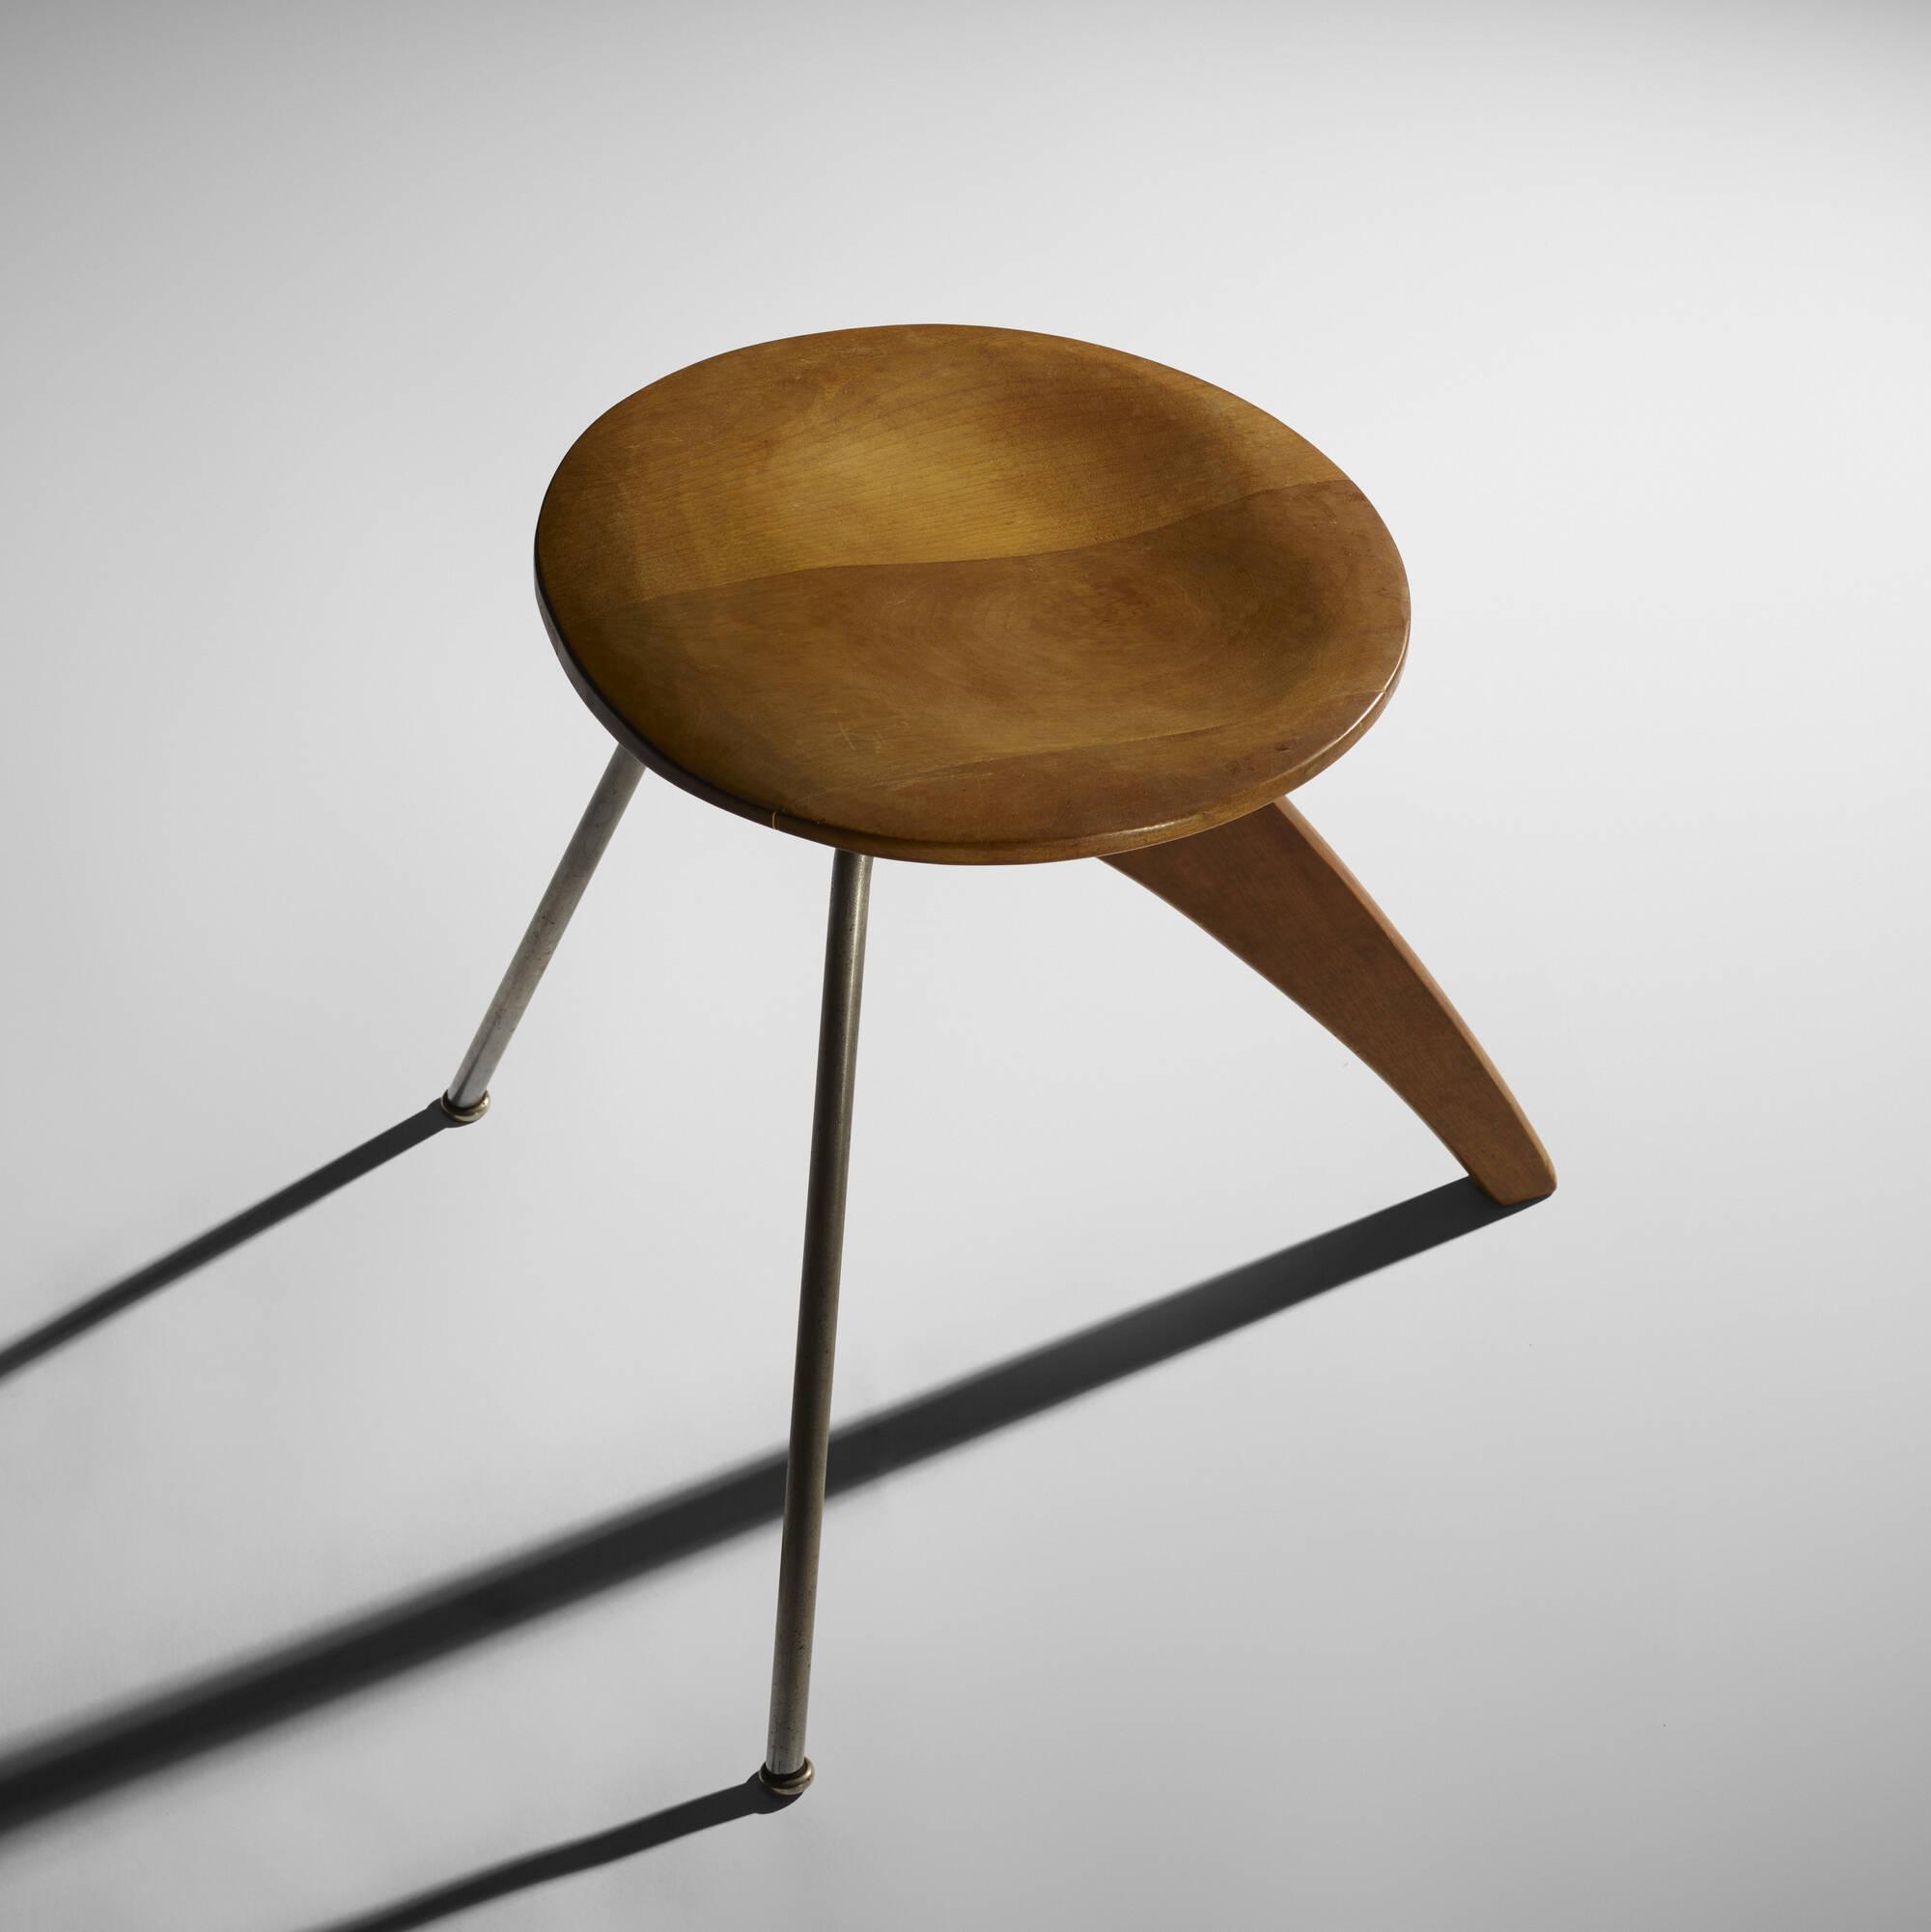 190: Isamu Noguchi / Rudder stools model IN-22, pair (3 of 3)